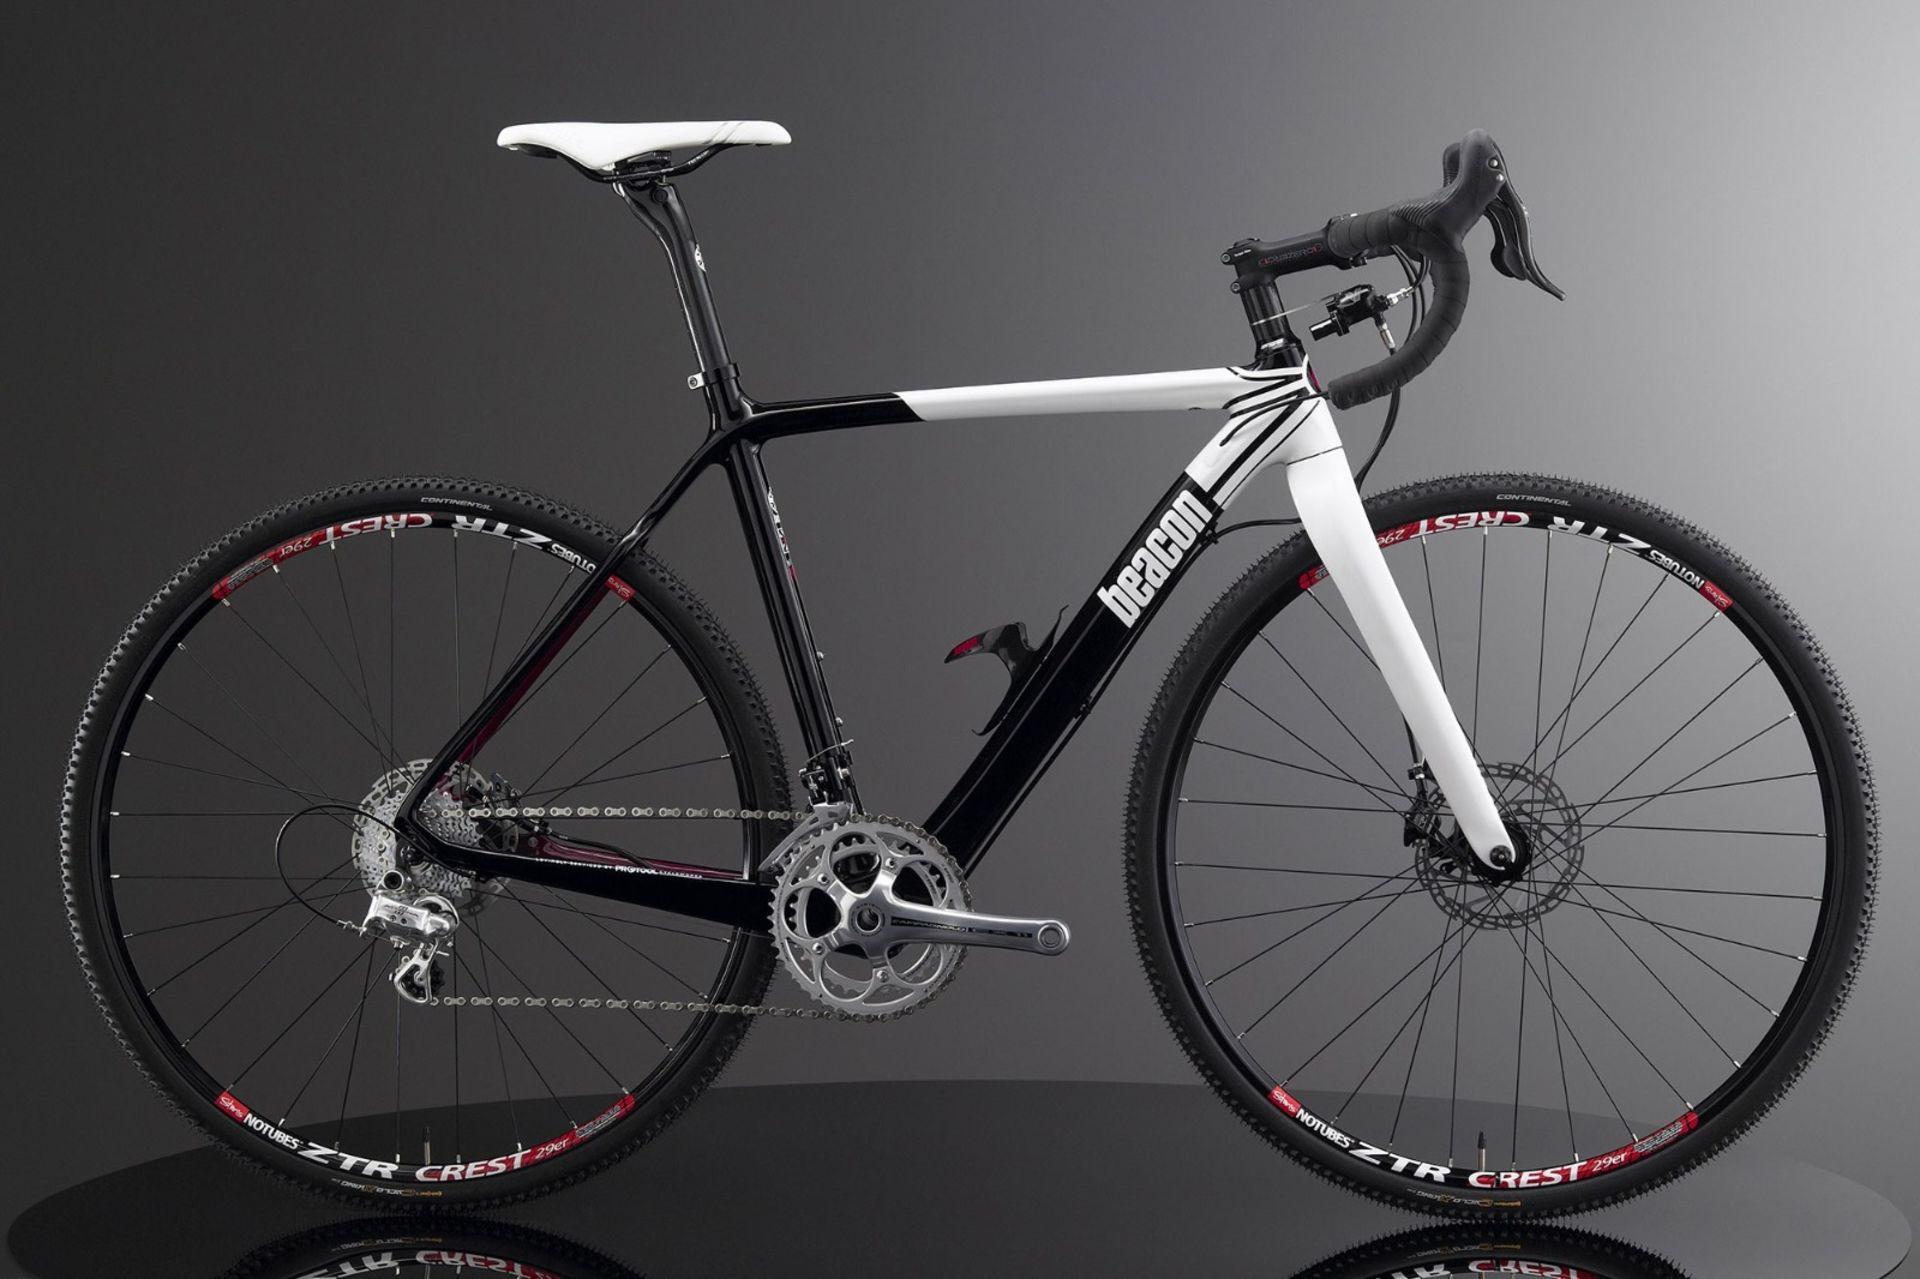 Lot 1 - 1 x Beacon Model BF-45, Size 580, Carbon Fibre Bike Frame in Black & White.